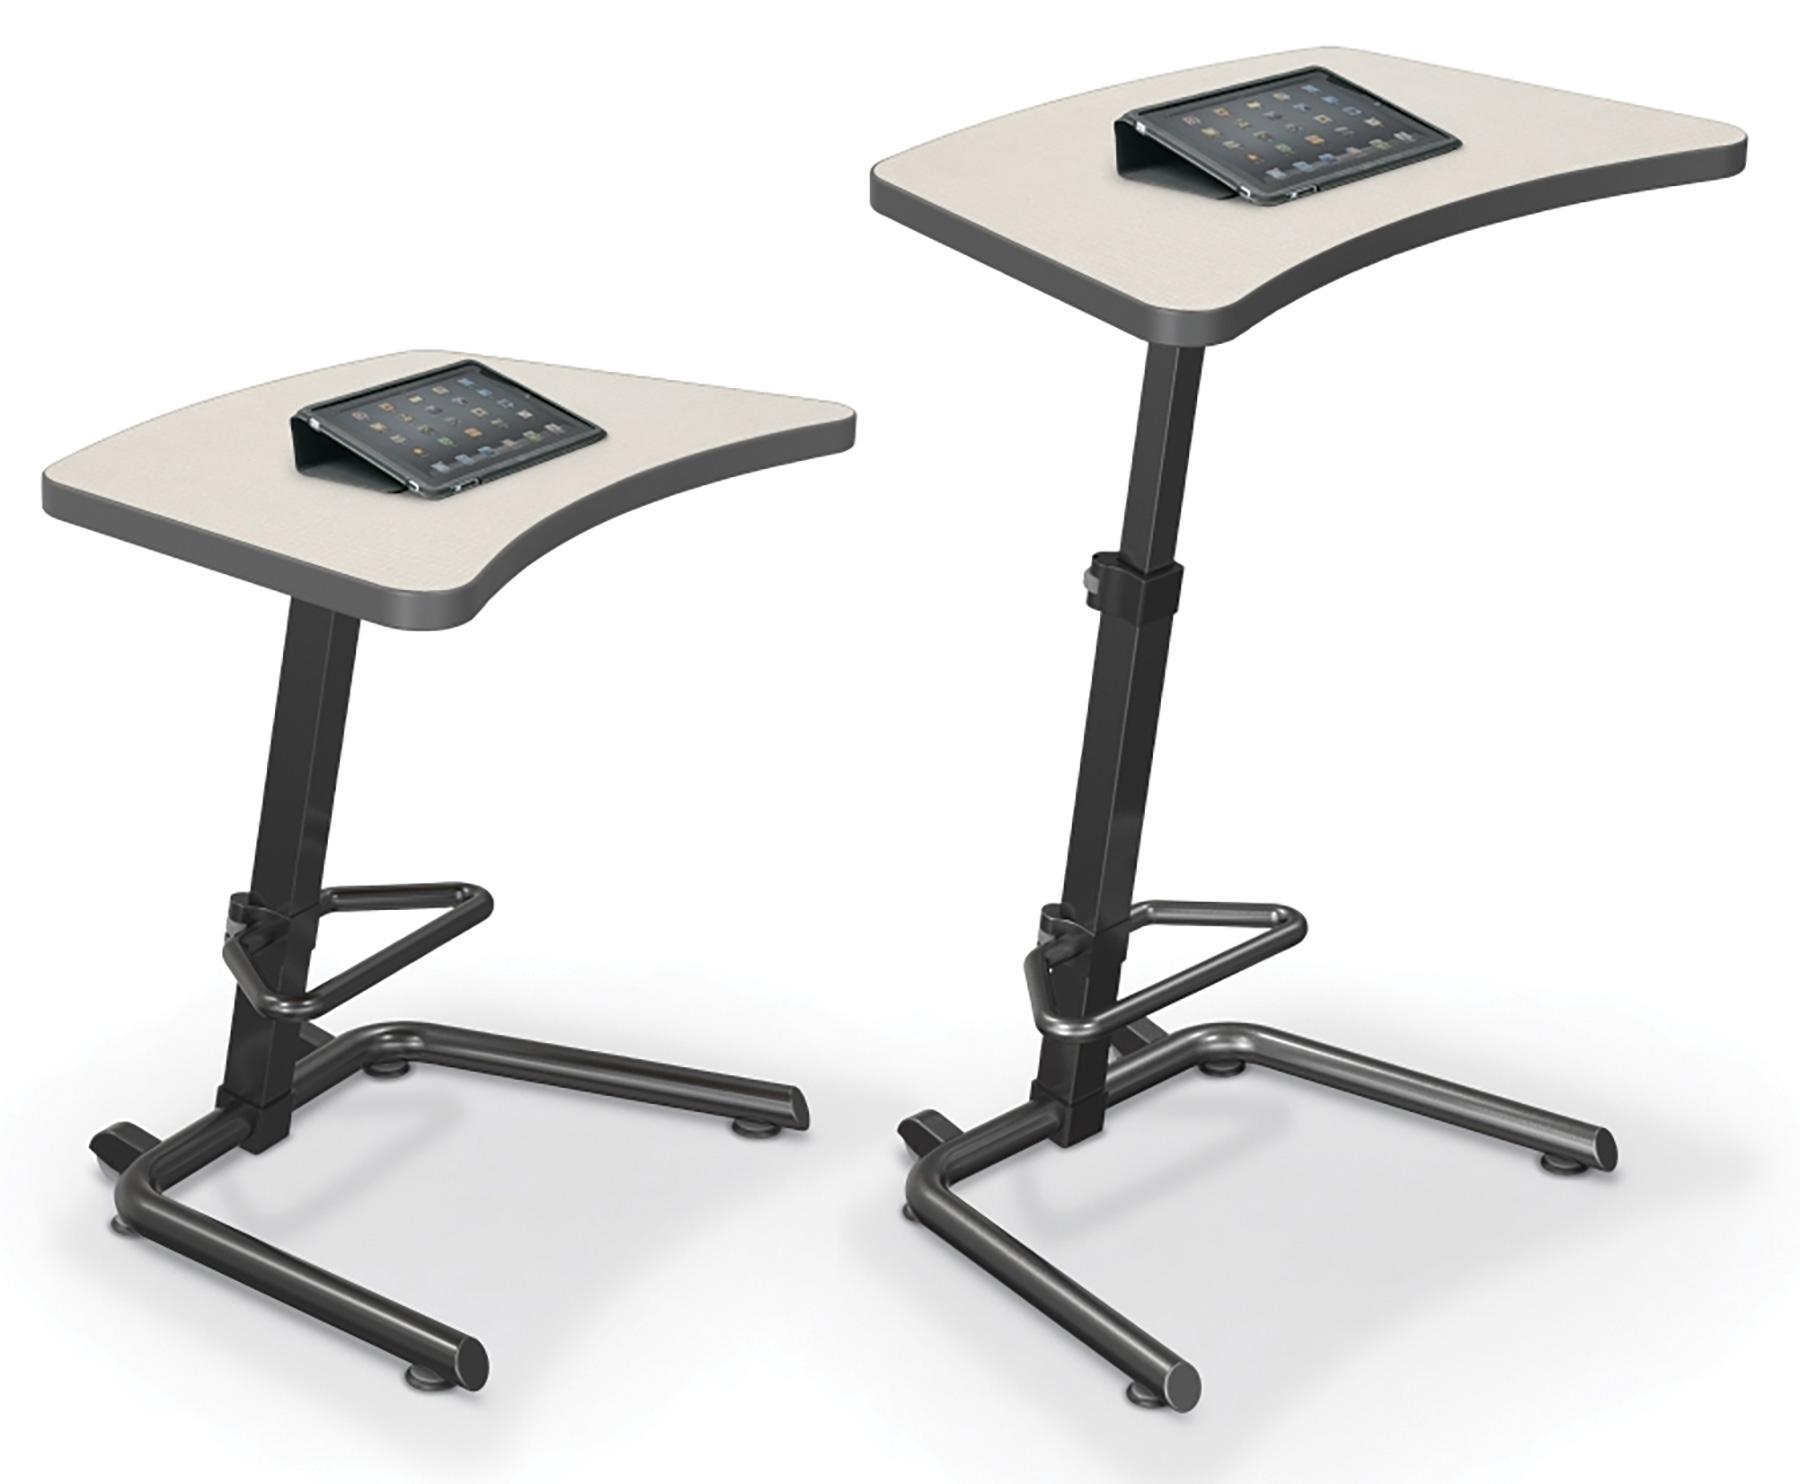 balt posture perfect chair recliner power active furniture idea gallery